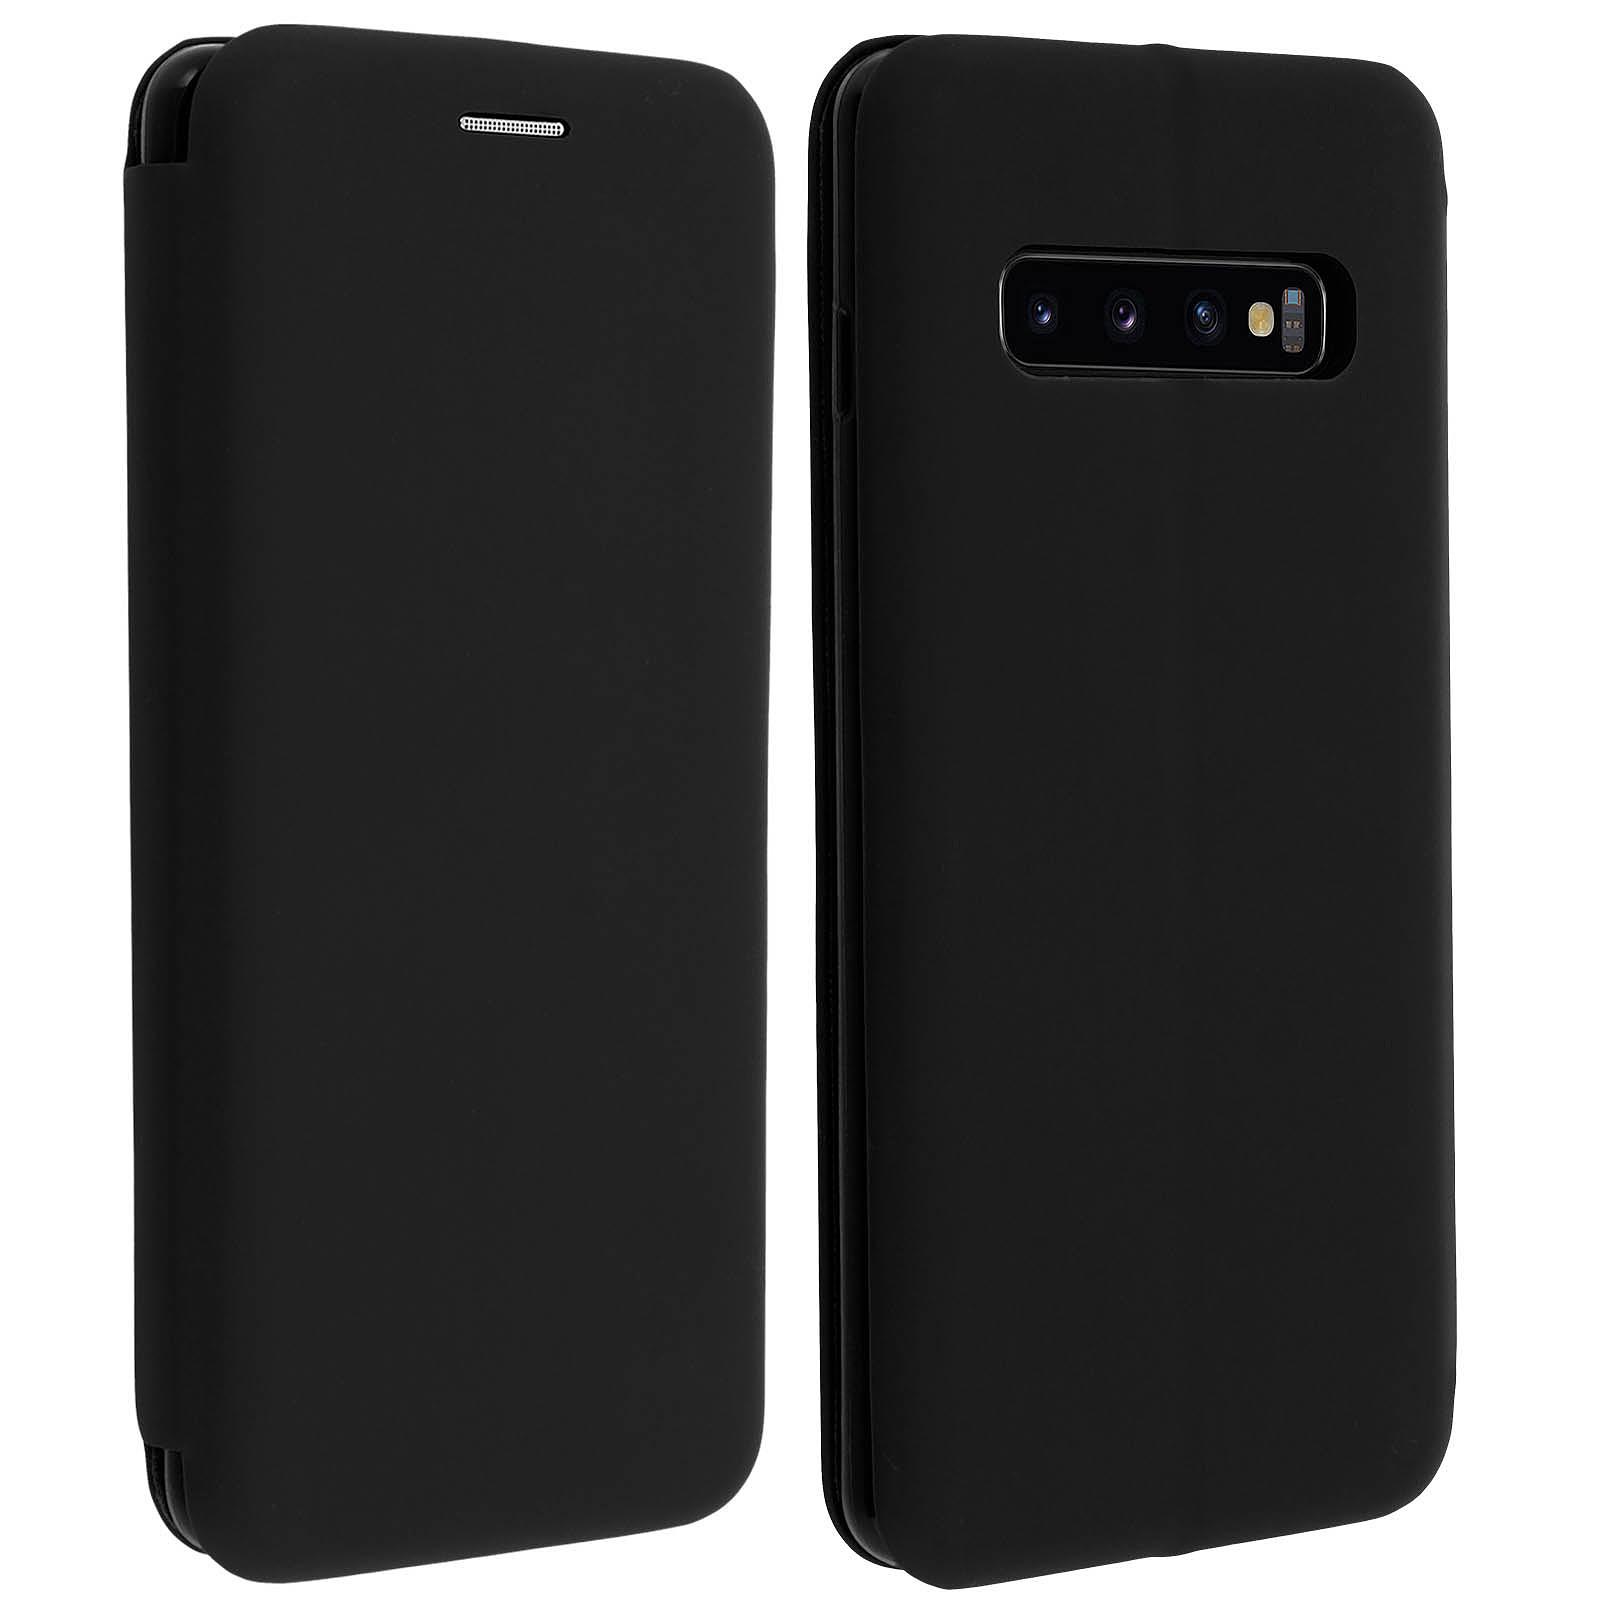 Avizar Etui folio Noir Stand Vidéo pour Samsung Galaxy S10 Plus